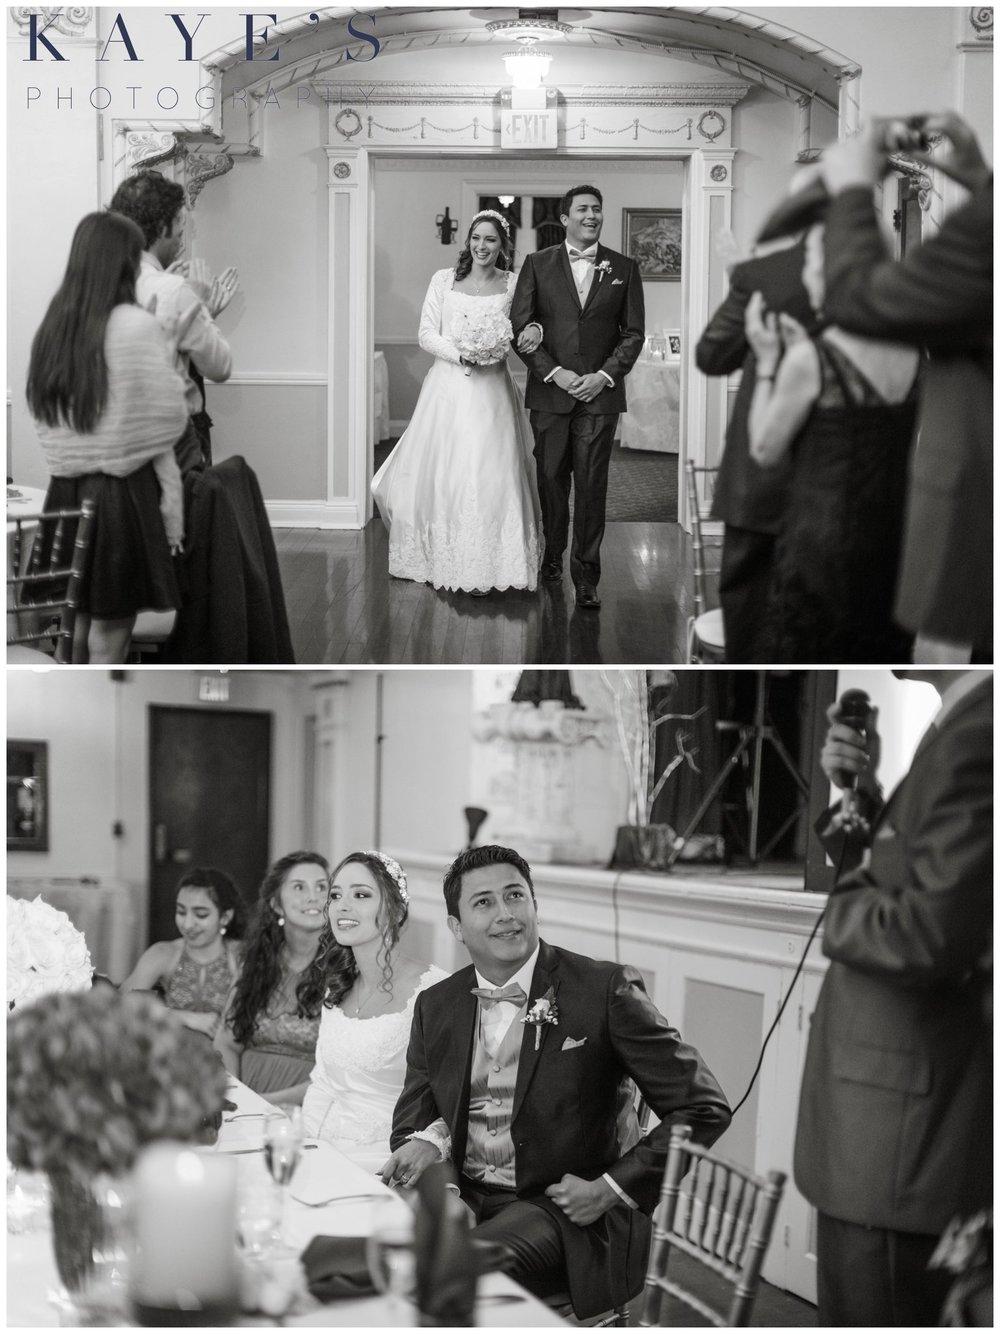 walking into reception, best man speech, clarkston wedding, head table, black and white, clarkston wedding reception, reception hall